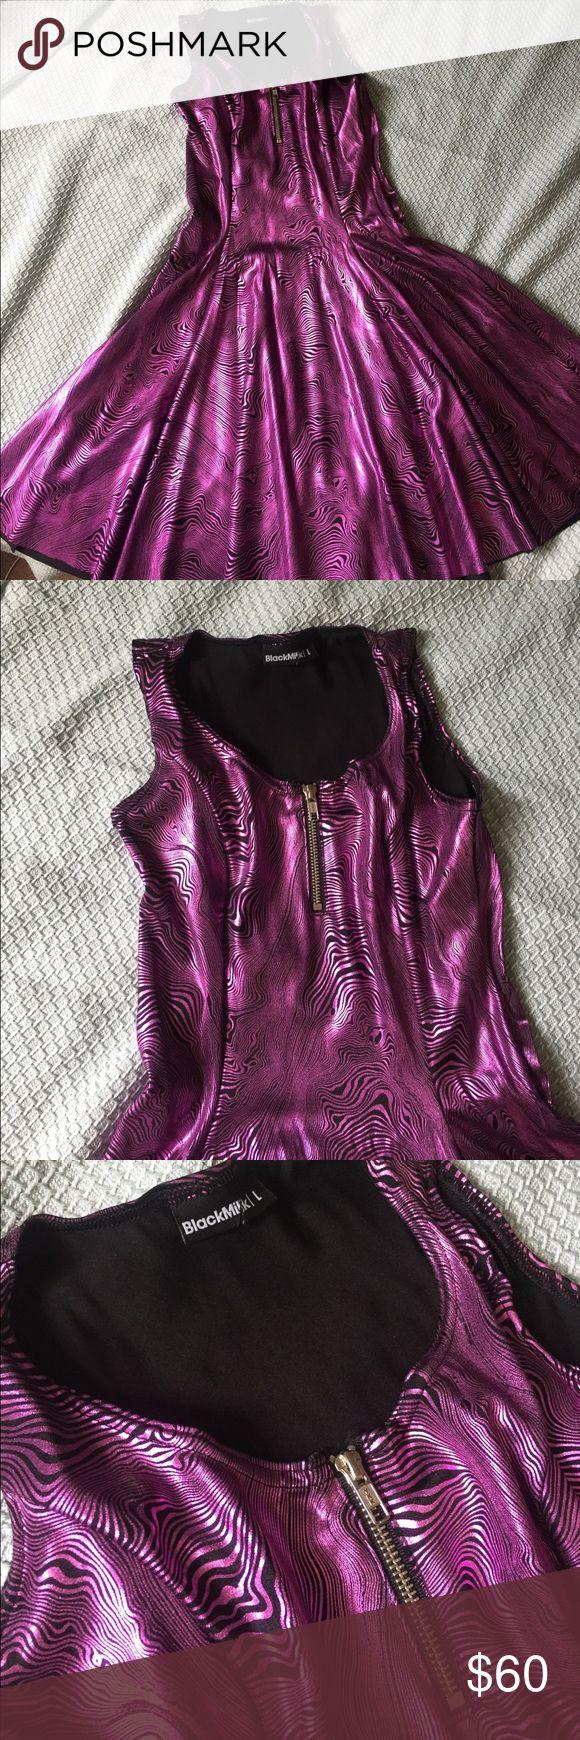 Black Milk Clothing Evil Zip Front Dress L Never worn Black Milk Clothing metallic pink/purple zip front skater dress size large Blackmilk Dresses